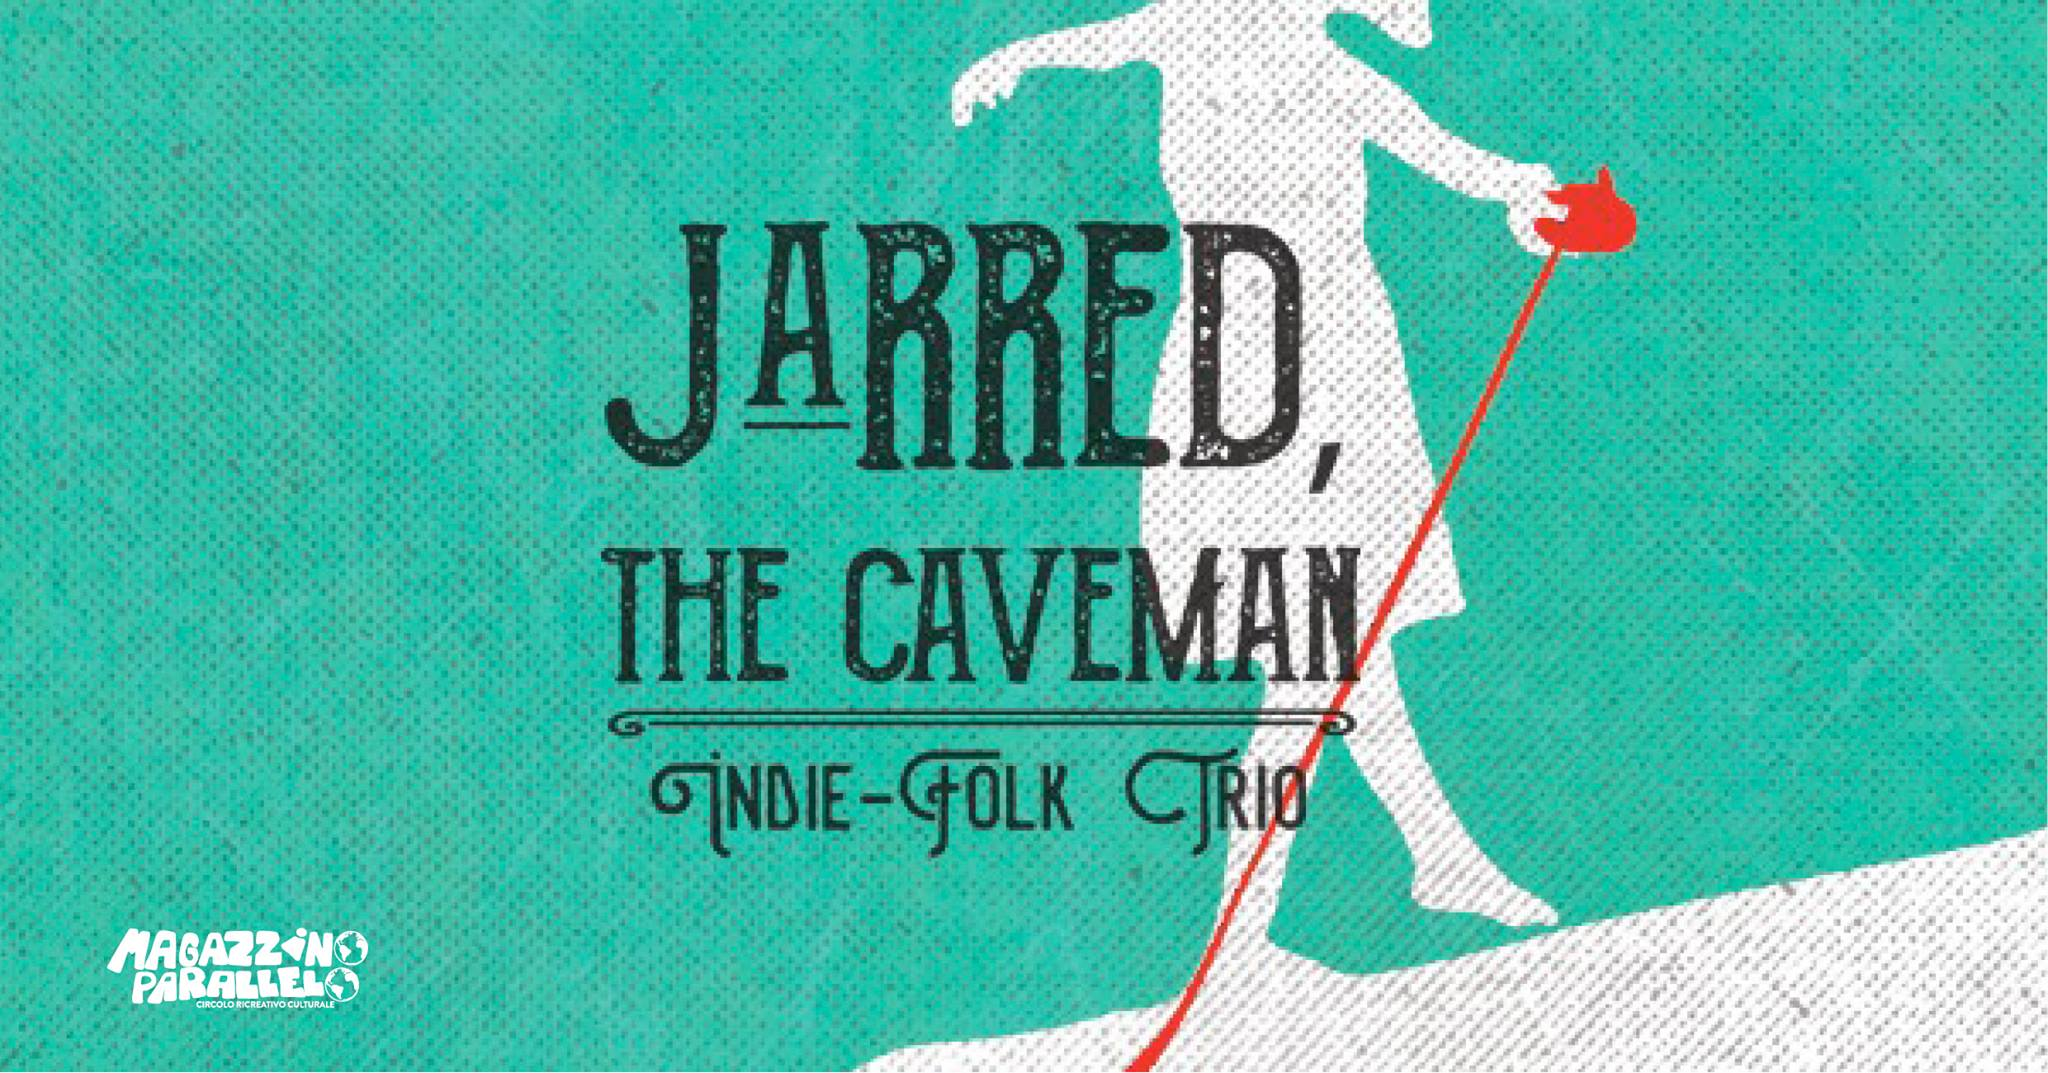 Jarred, the caveman ⌁ Indie-Folk Trio ⌁ at Magazzino Parallelo